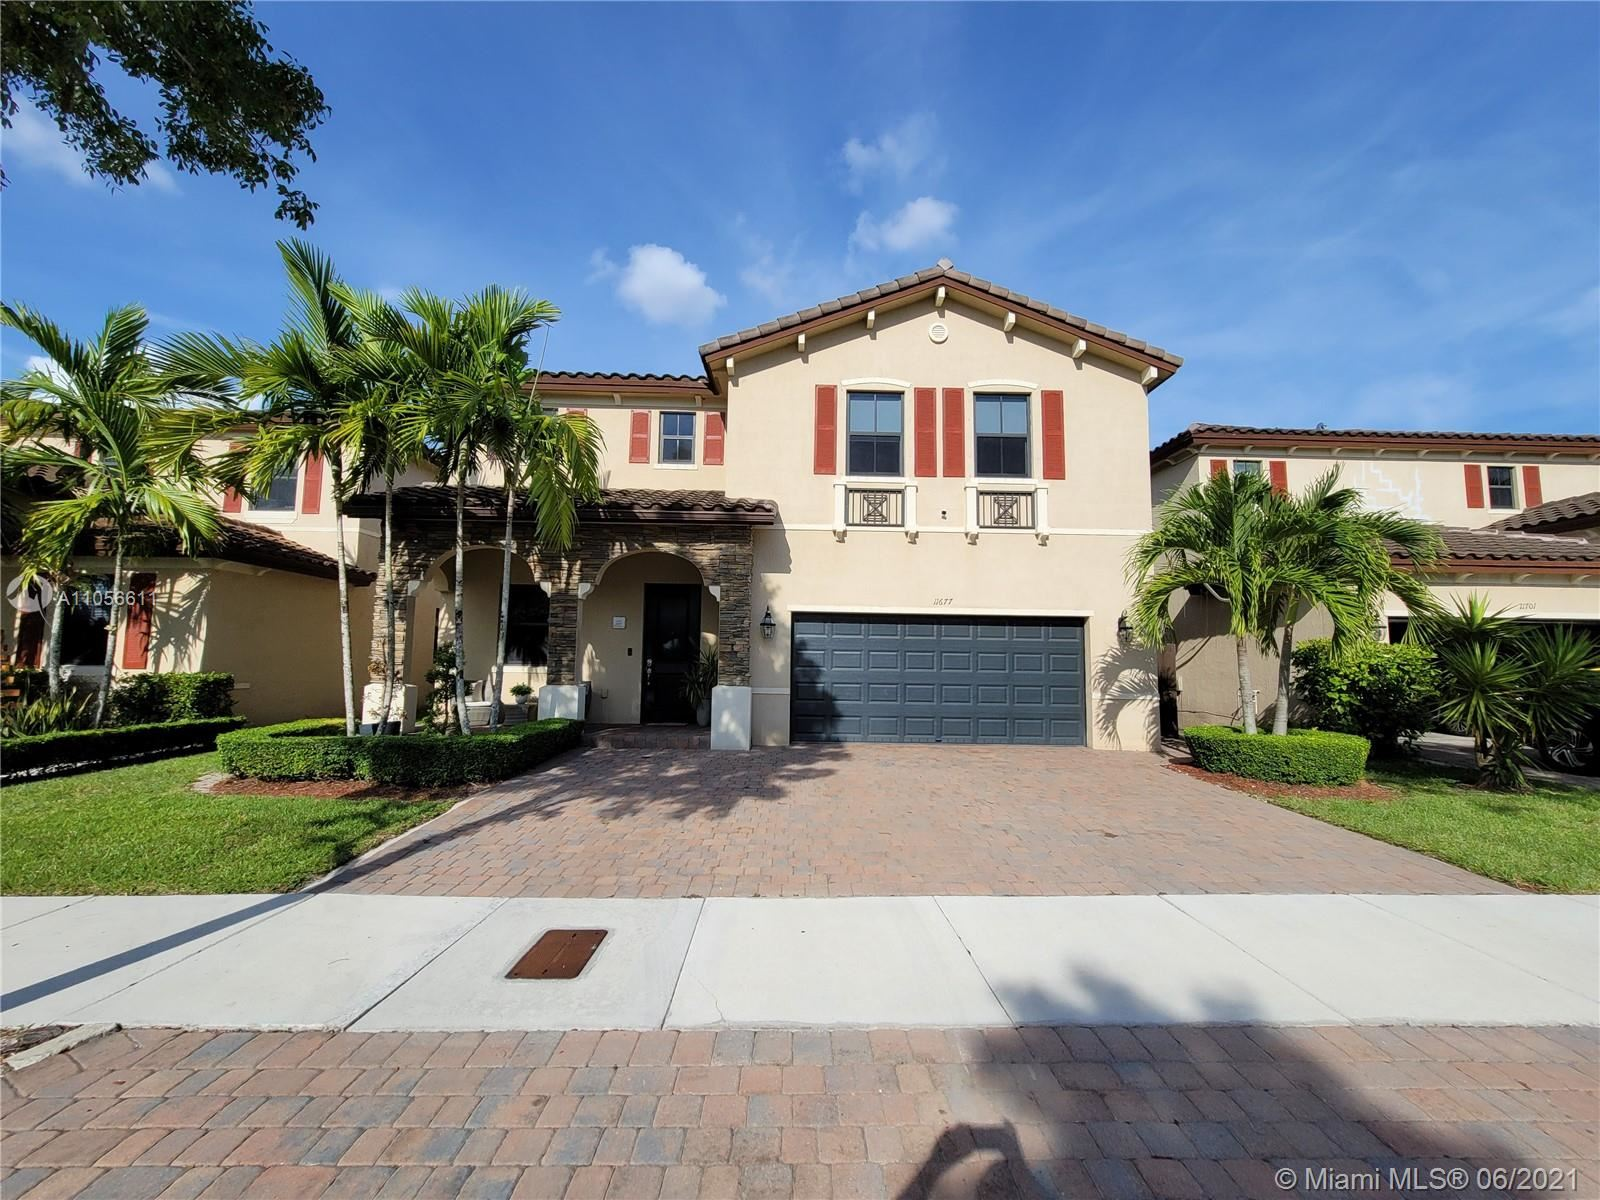 11677 SW 151st Pl, Miami, FL 33196 - #: A11056611